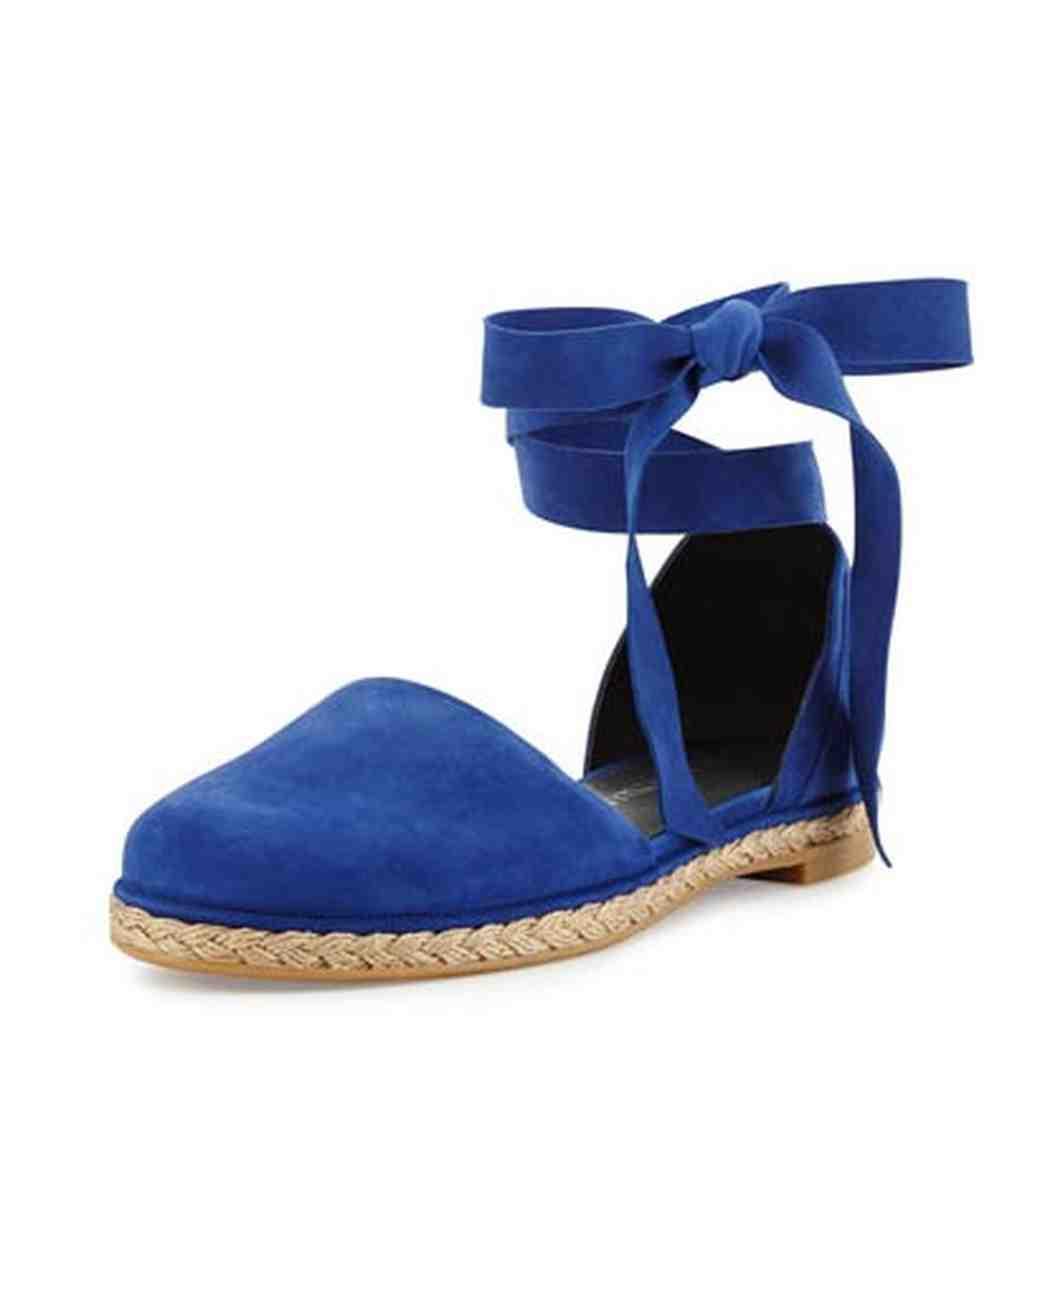 wedding-flats-bergdorf-goodman-blue-suede-strappy-shoes-0216.jpg